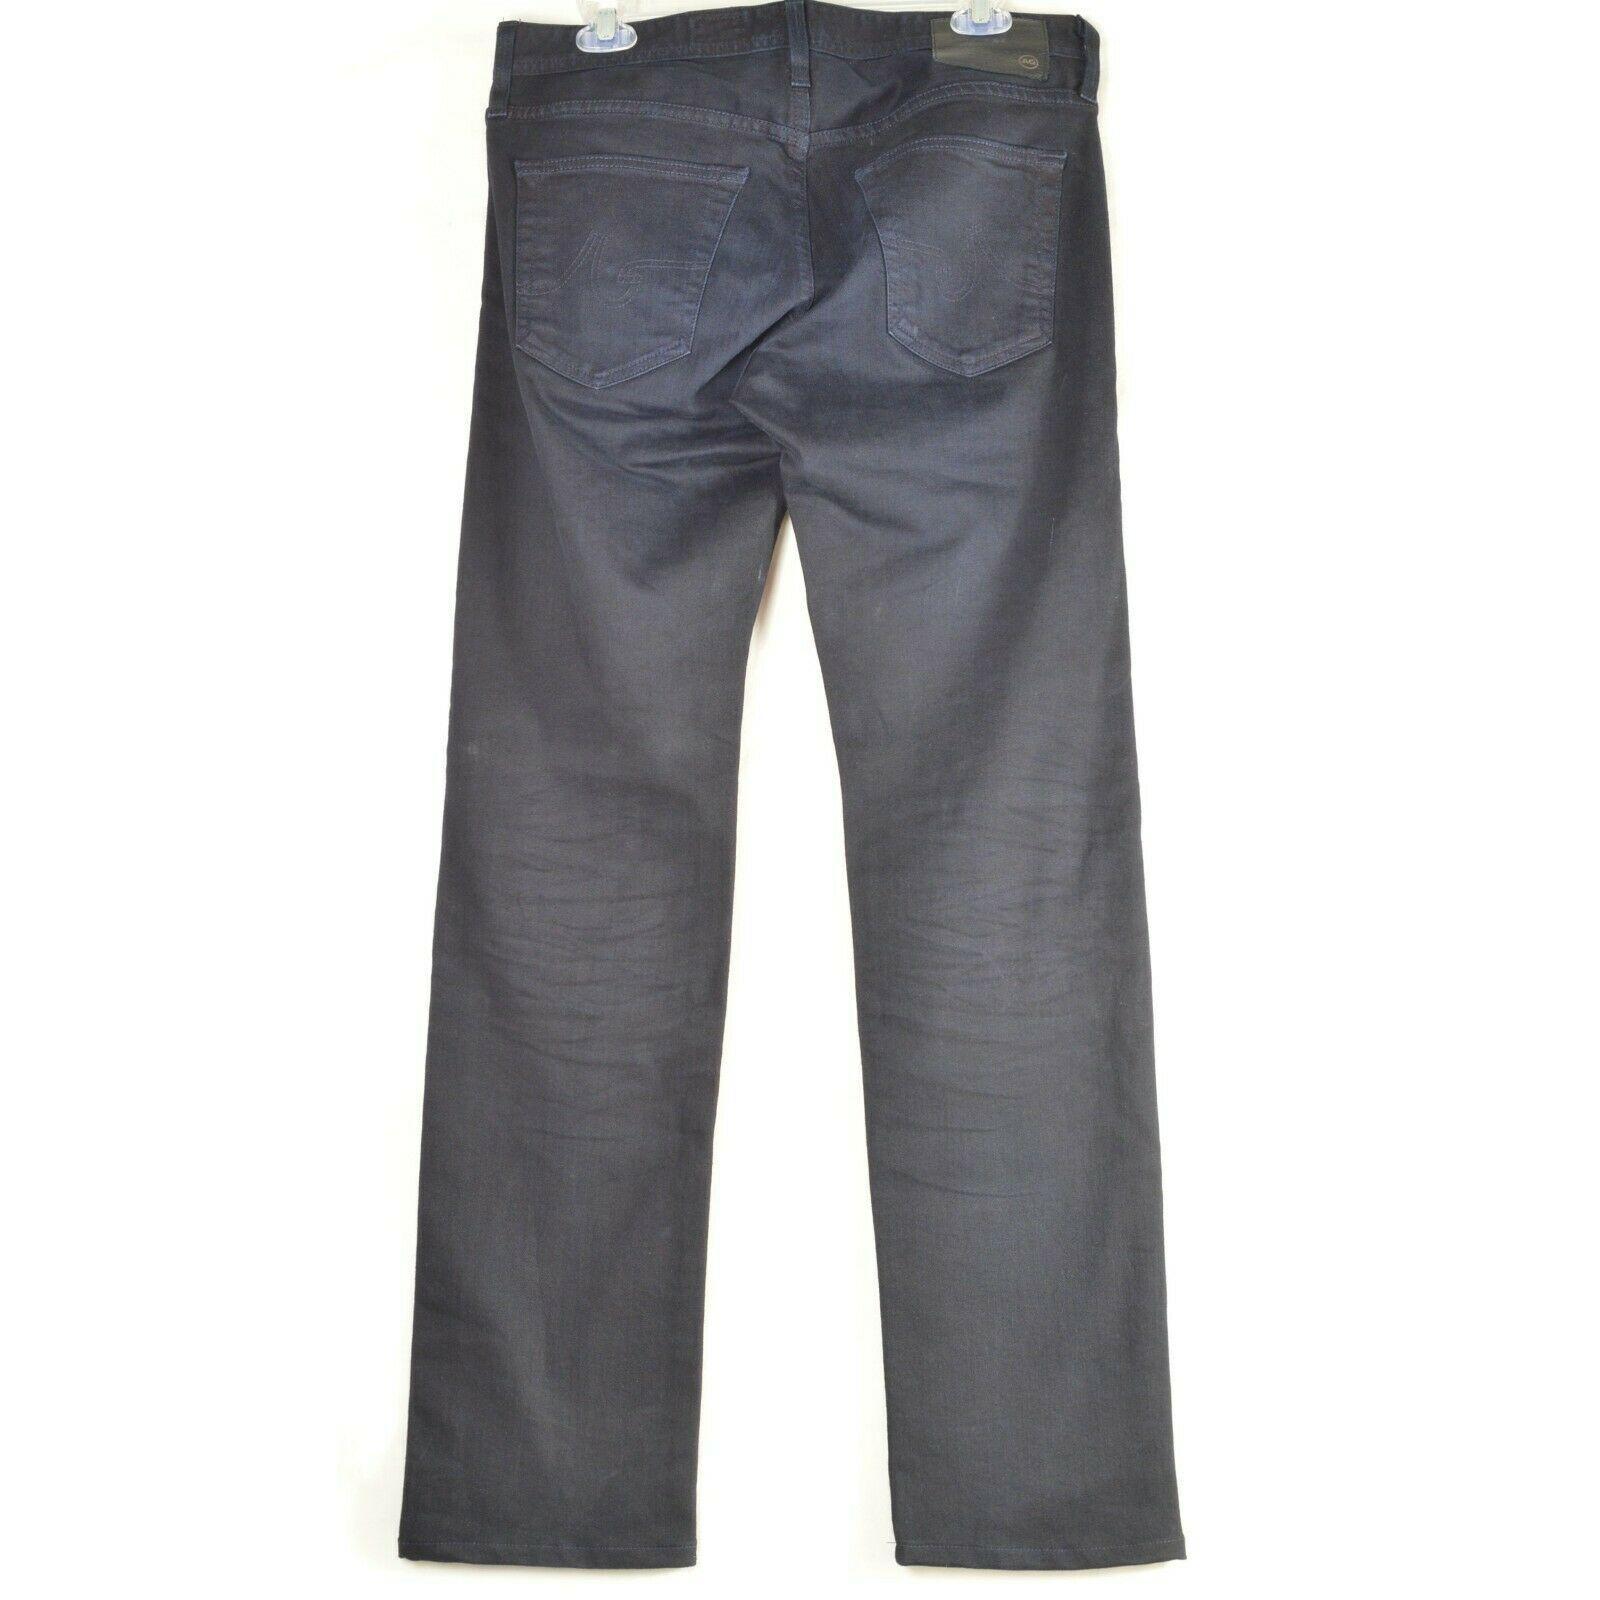 AG Adriano Goldschmied jeans 30 x 34 men Matchbox dark Slim Straight tall unique image 12